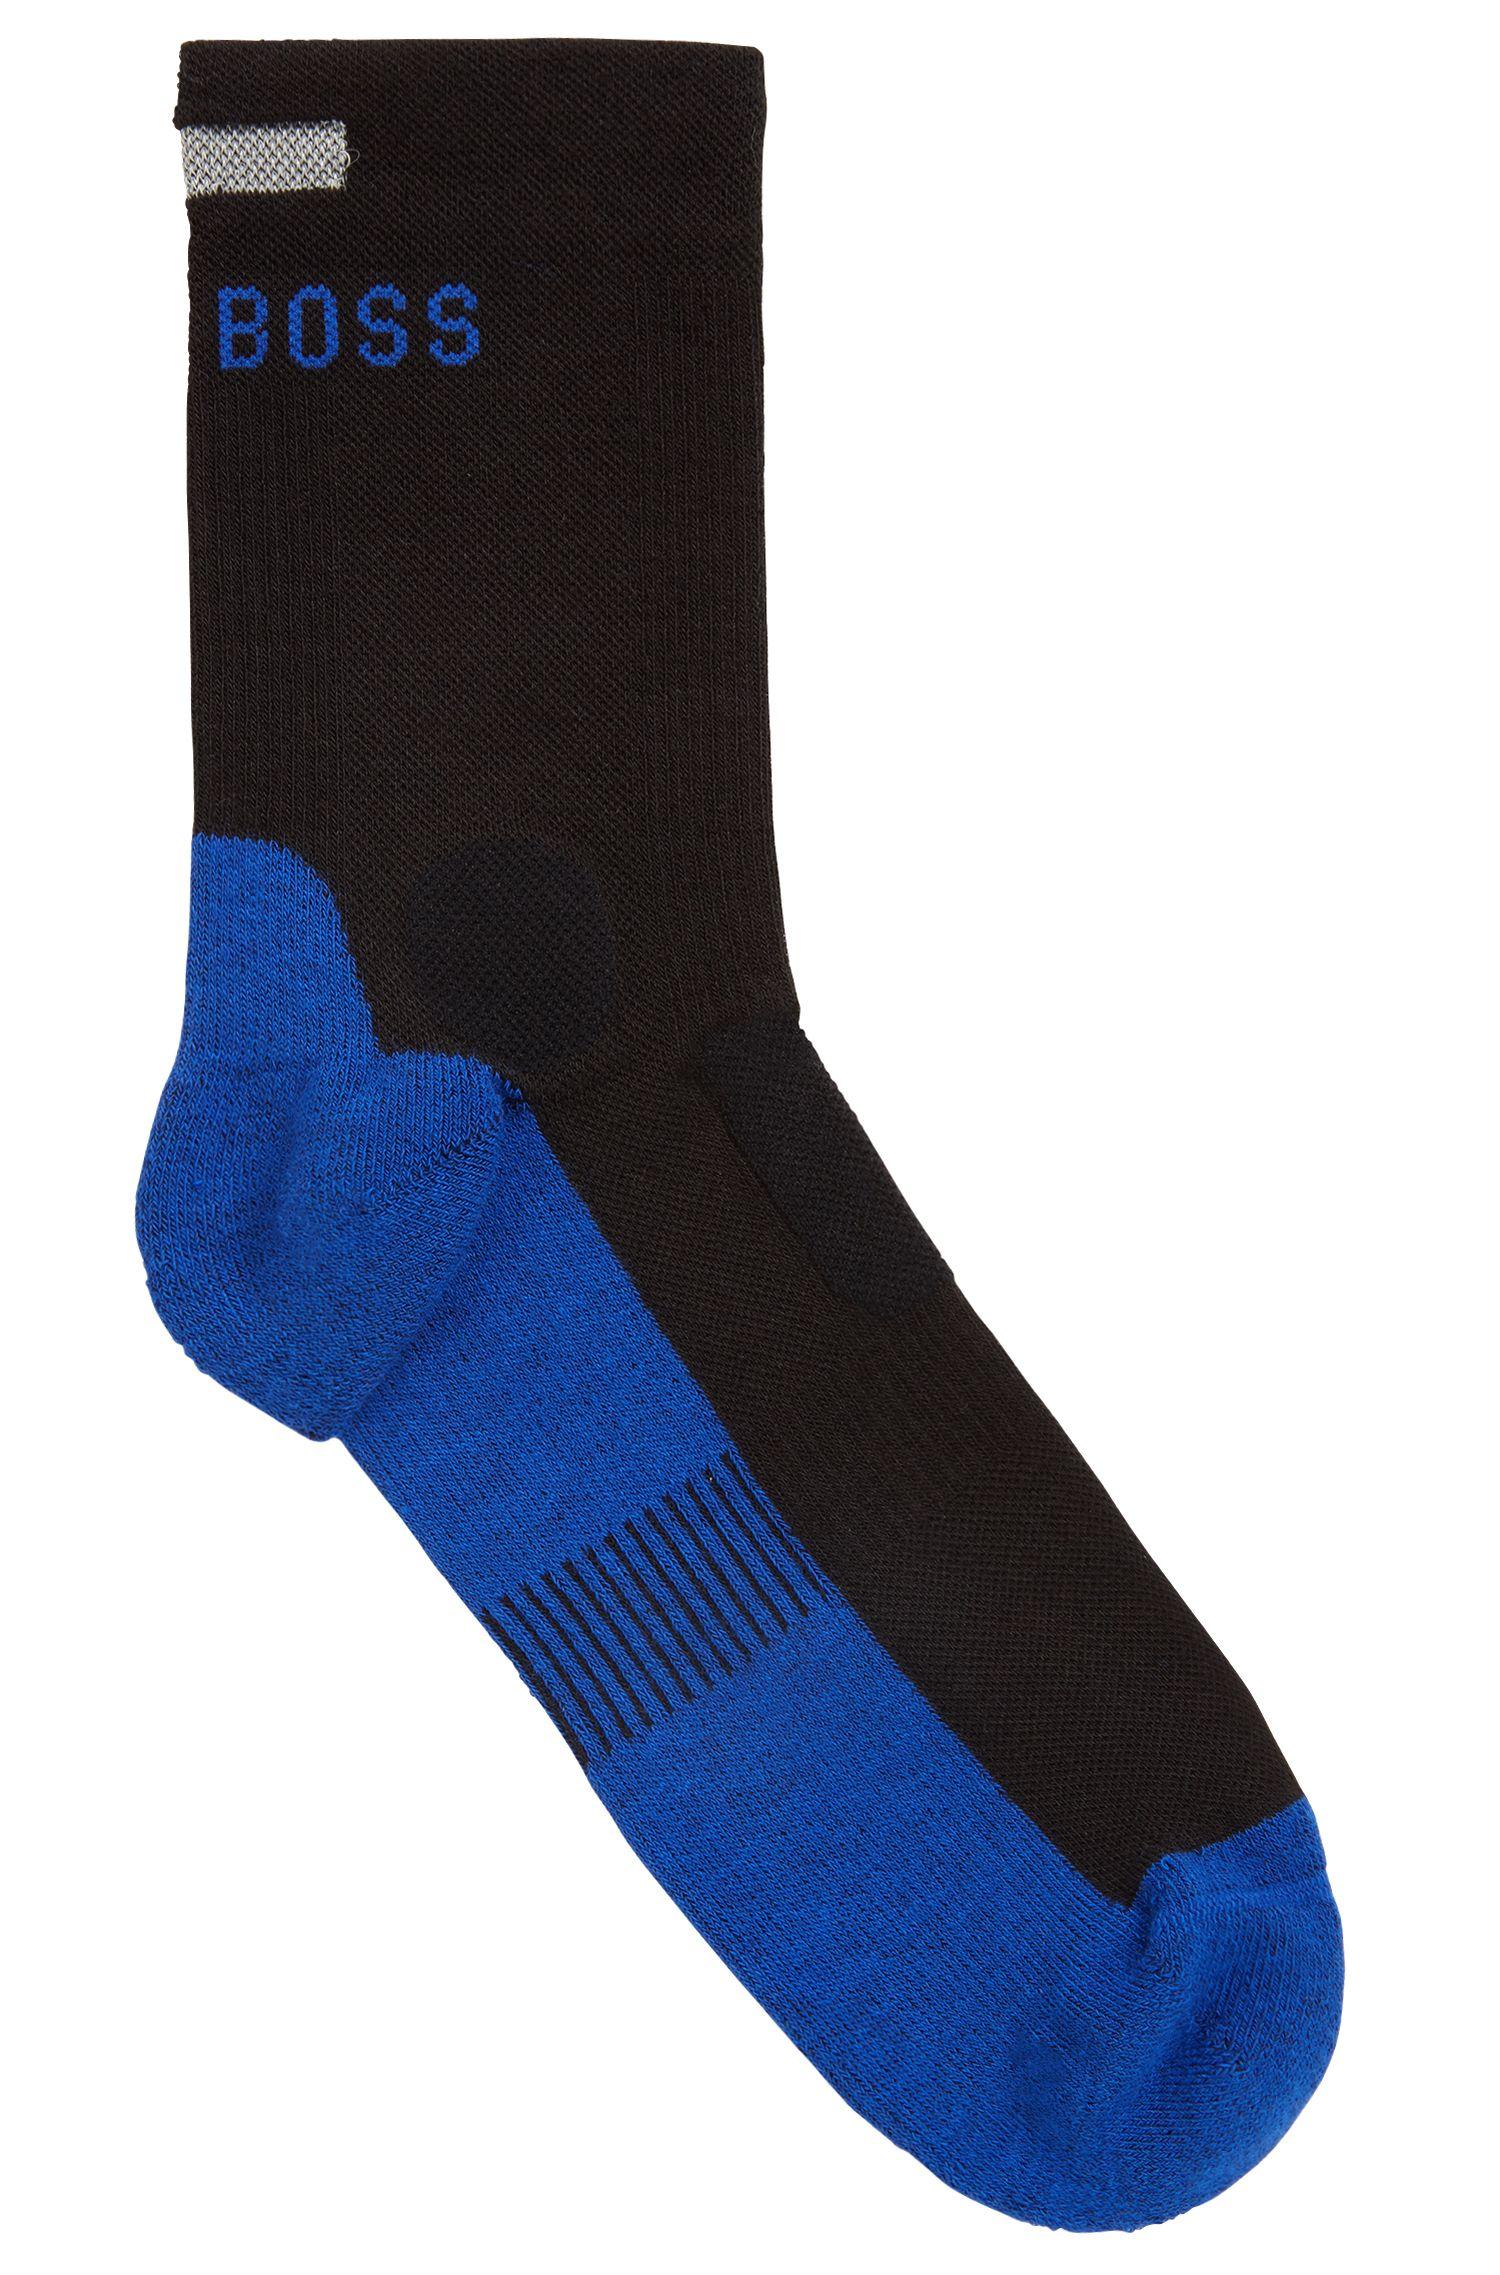 Regular-length socks in COOLMAX® fabric